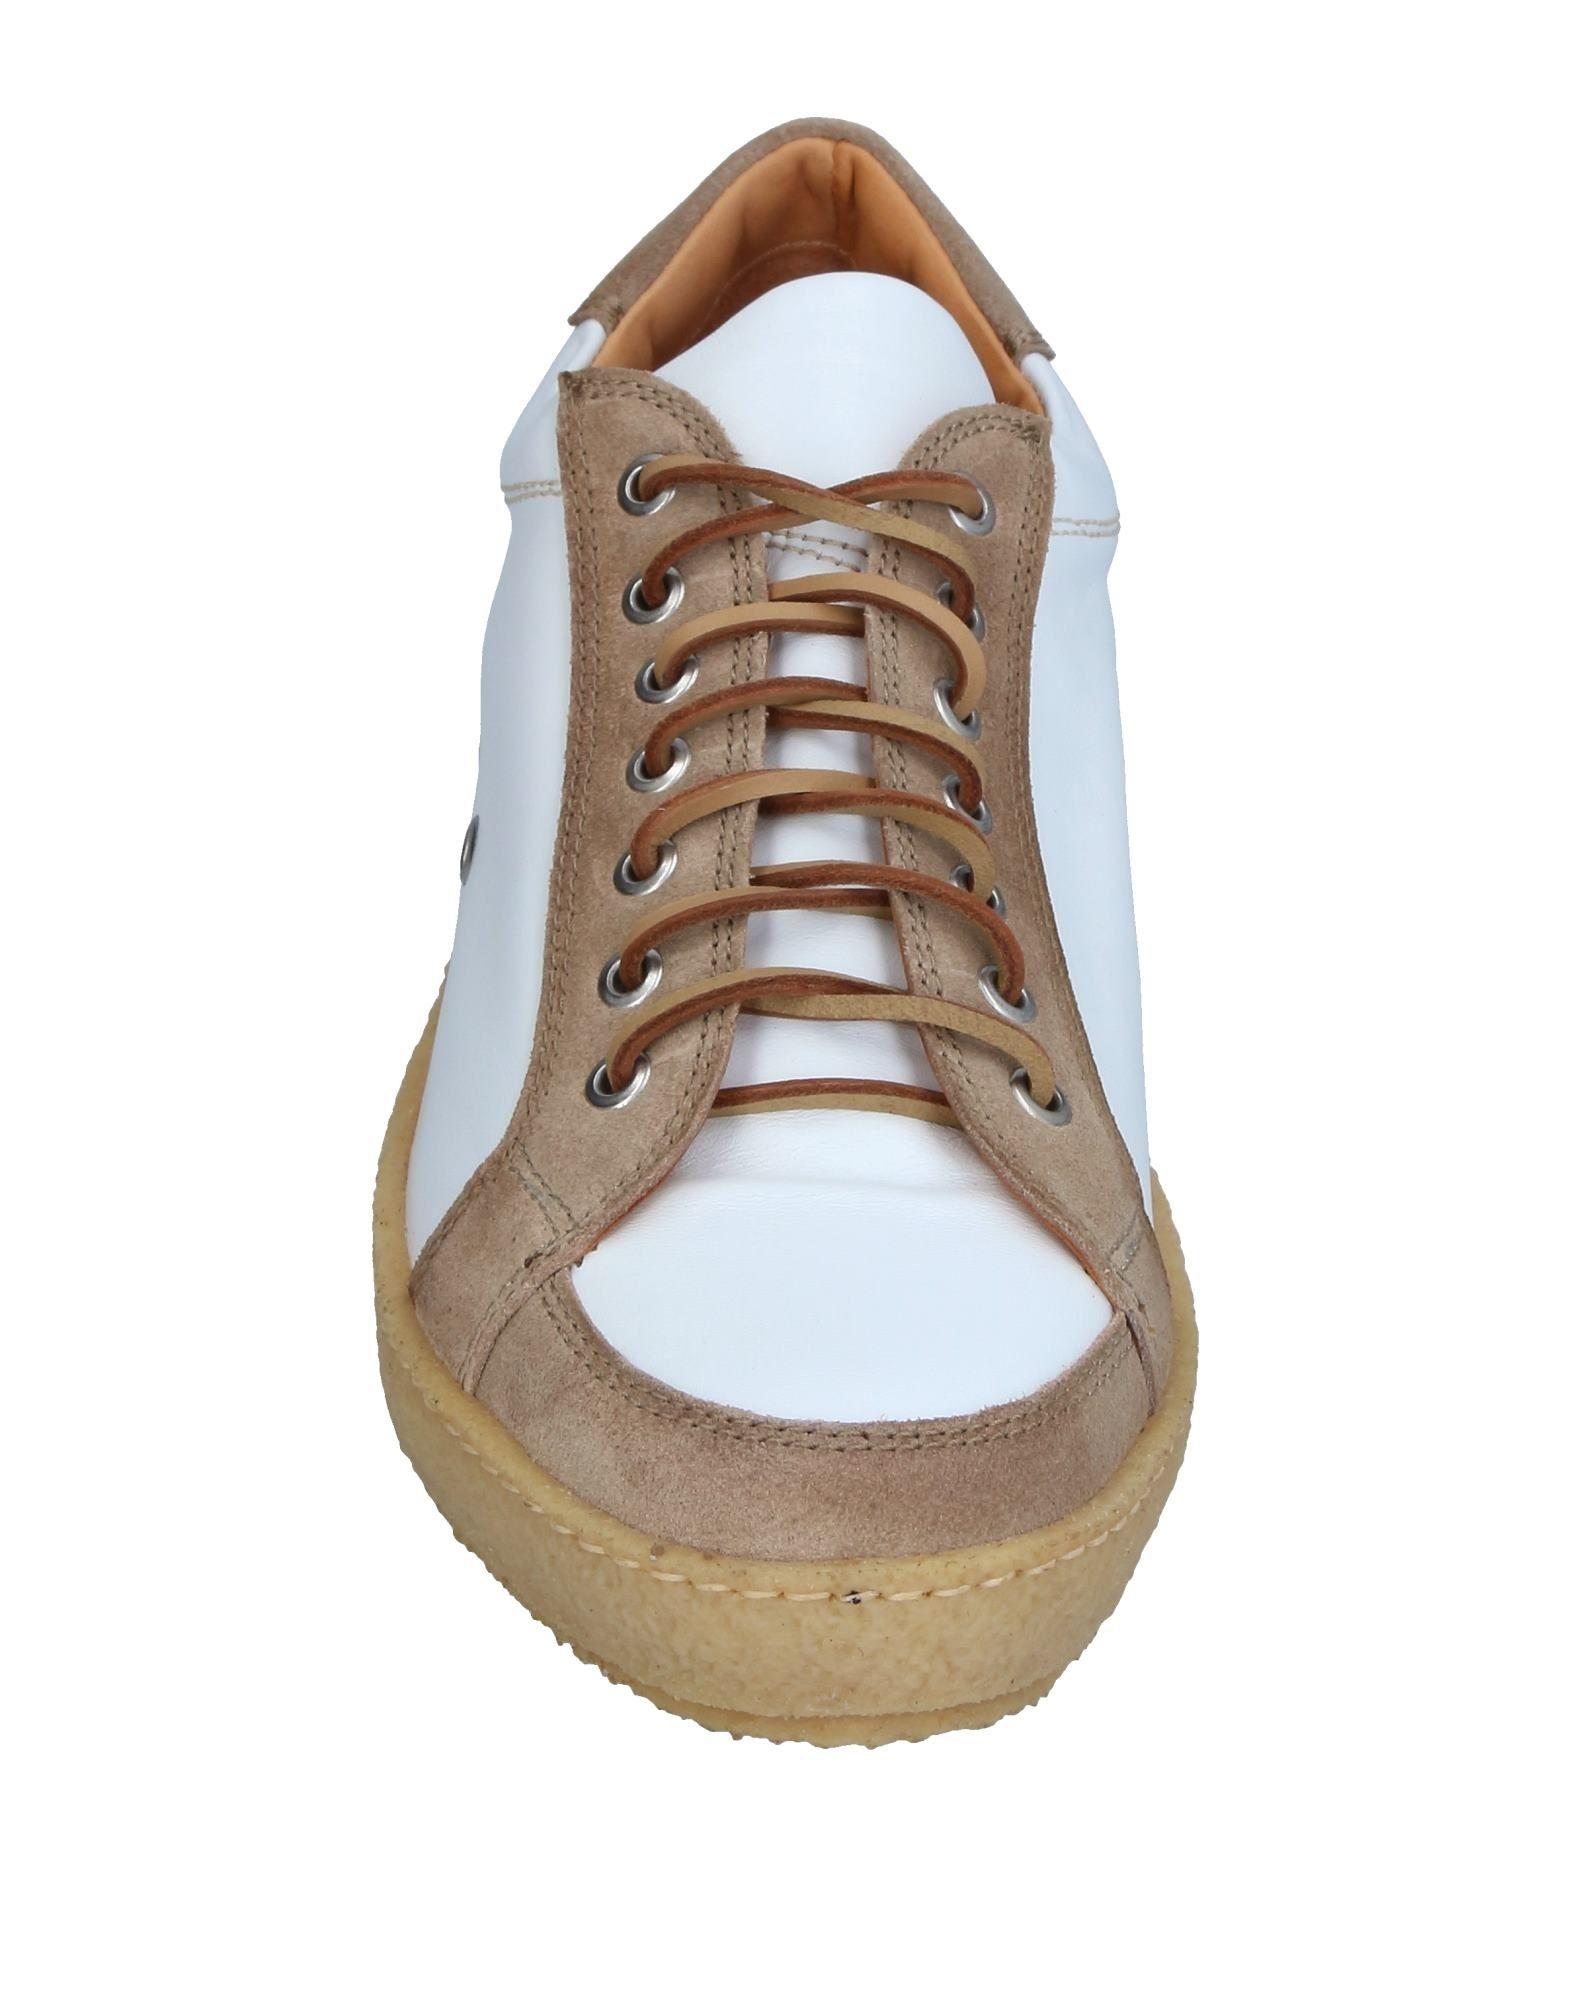 Rabatt echte Schuhe Pantofola D'oro Herren Sneakers Herren D'oro  11353796NH 33418e